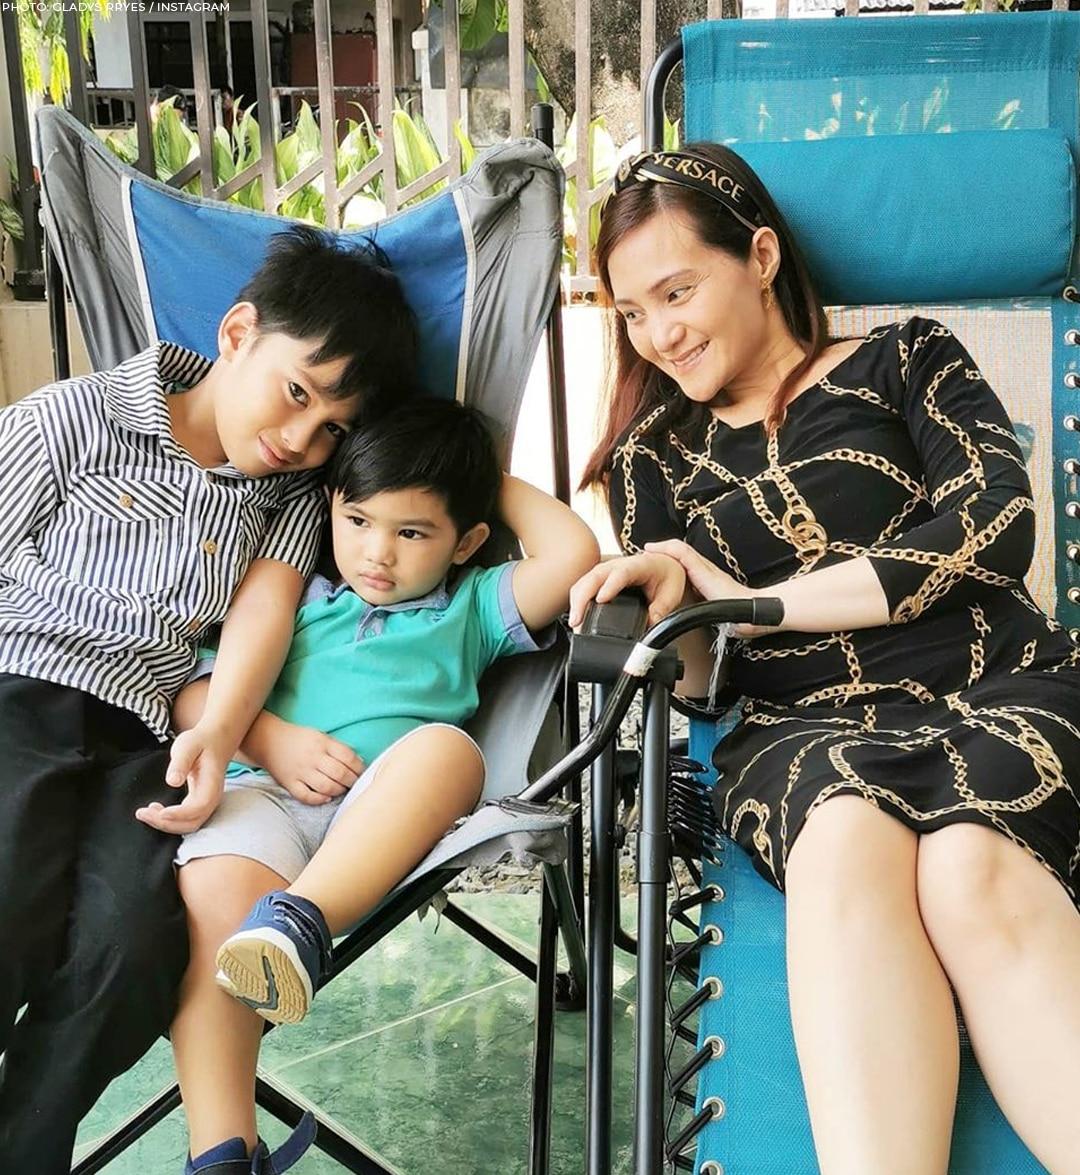 Gladys Reyes' beautiful family photos